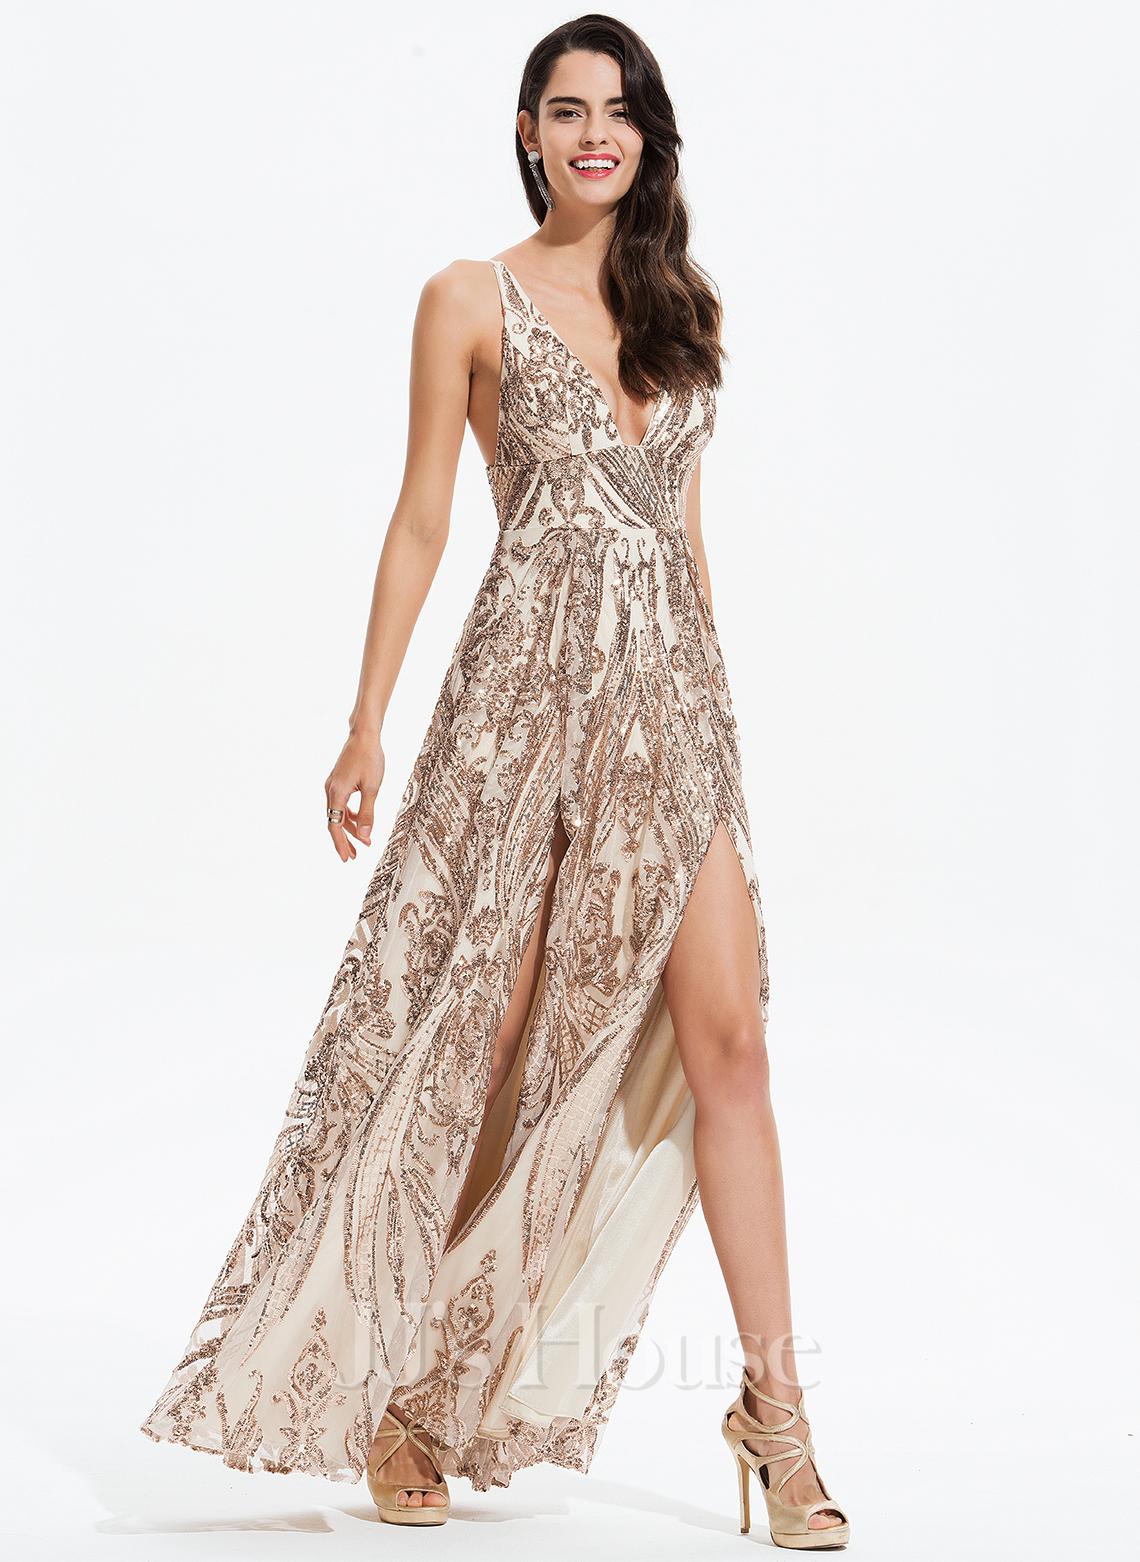 A-Line V-neck Floor-Length Sequined Prom Dresses With Split Front